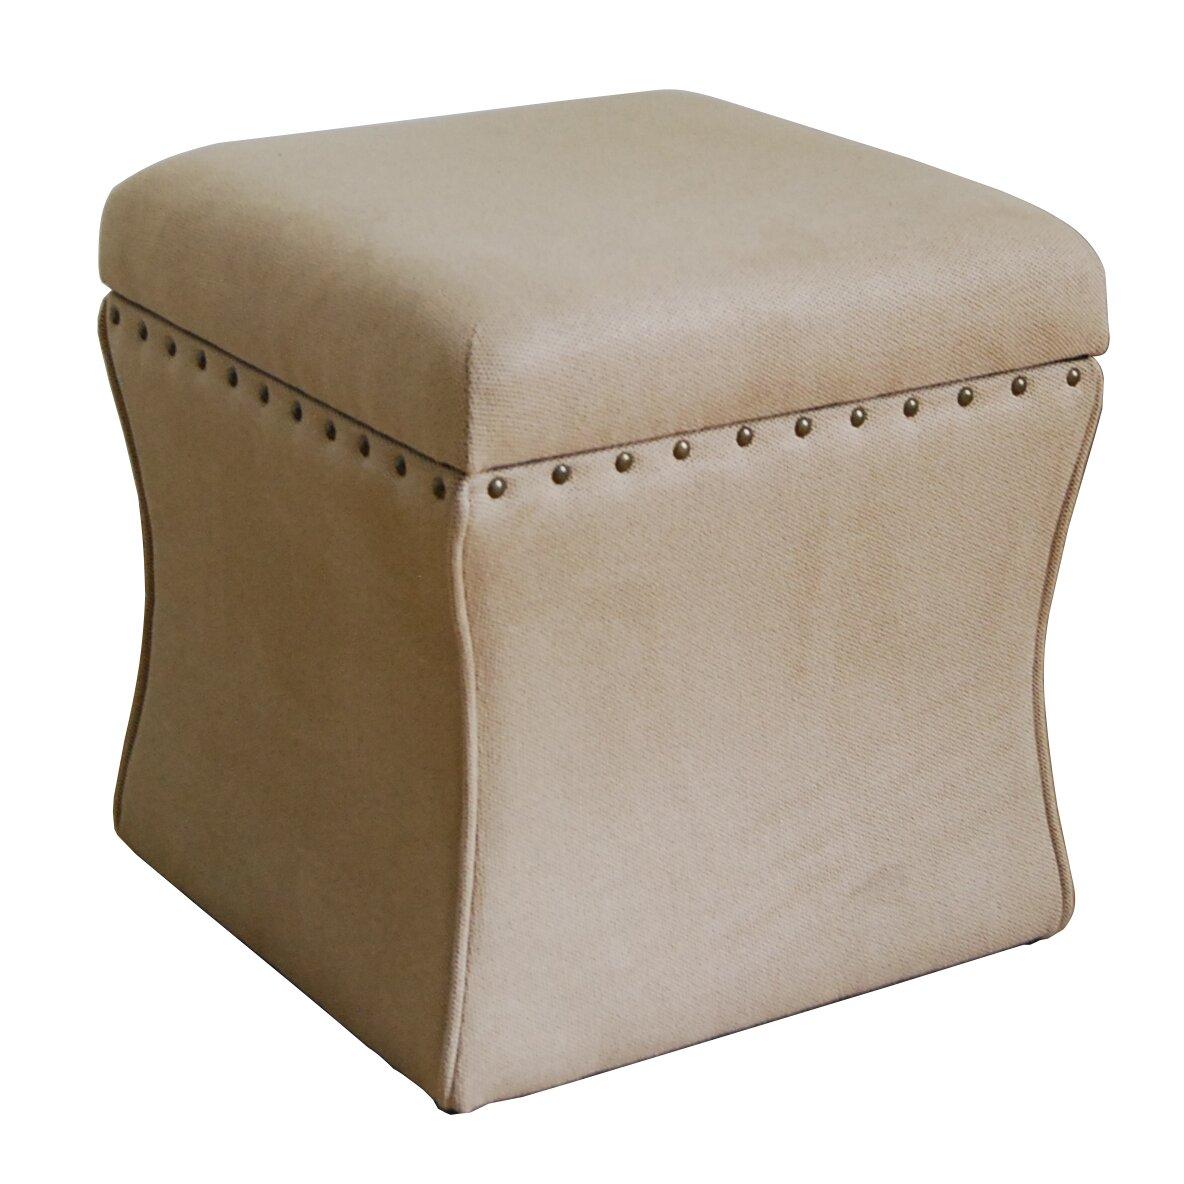 homepop cinch upholstered storage cube ottoman reviews. Black Bedroom Furniture Sets. Home Design Ideas